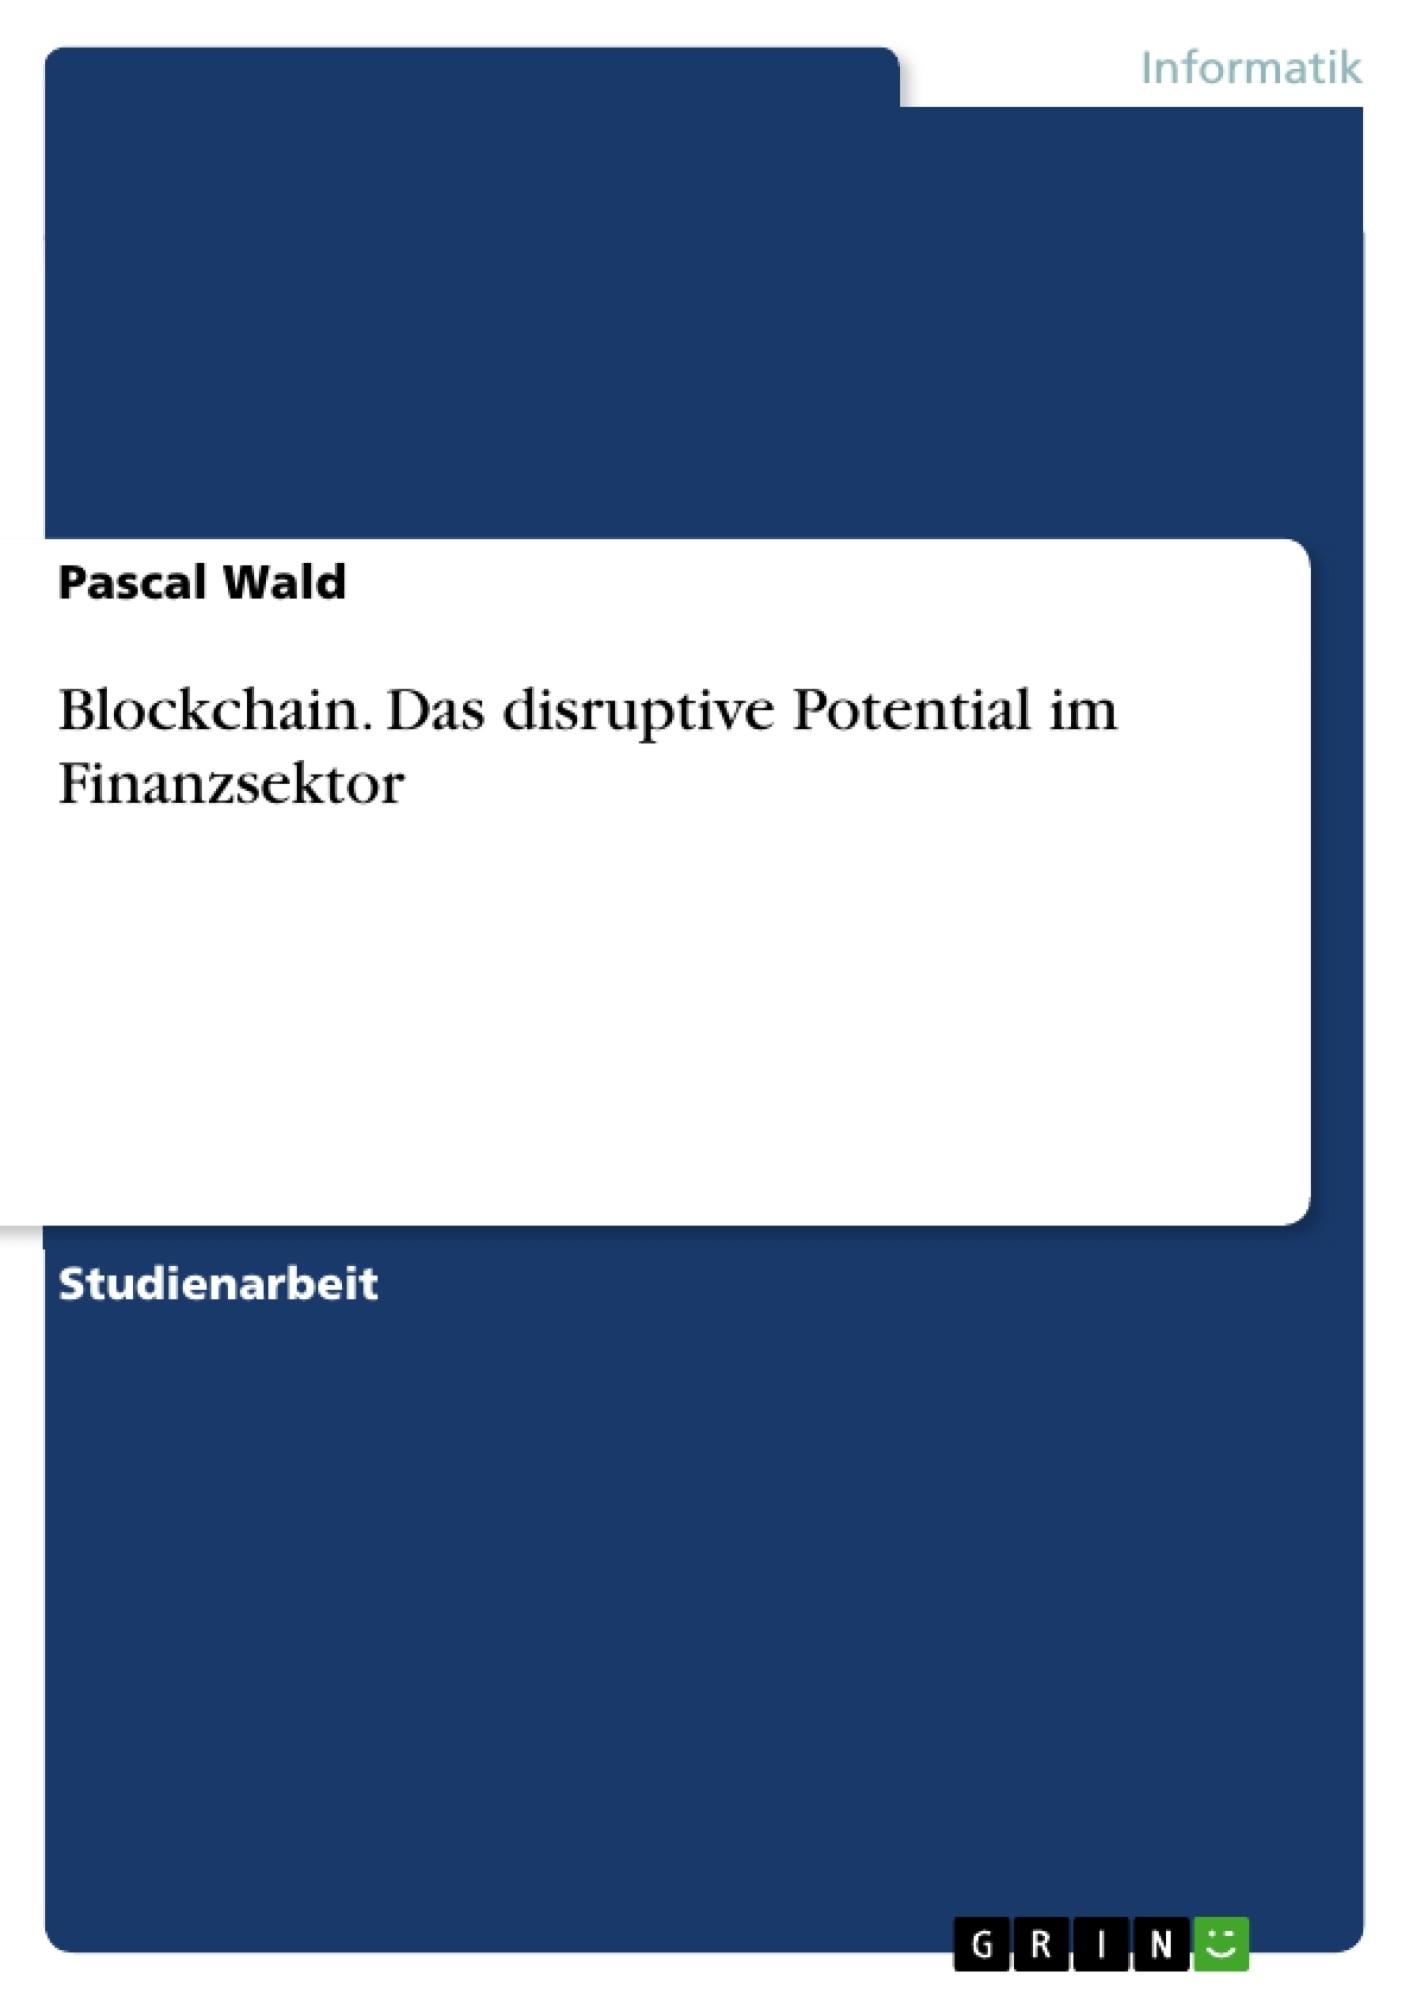 Titel: Blockchain. Das disruptive Potential im Finanzsektor